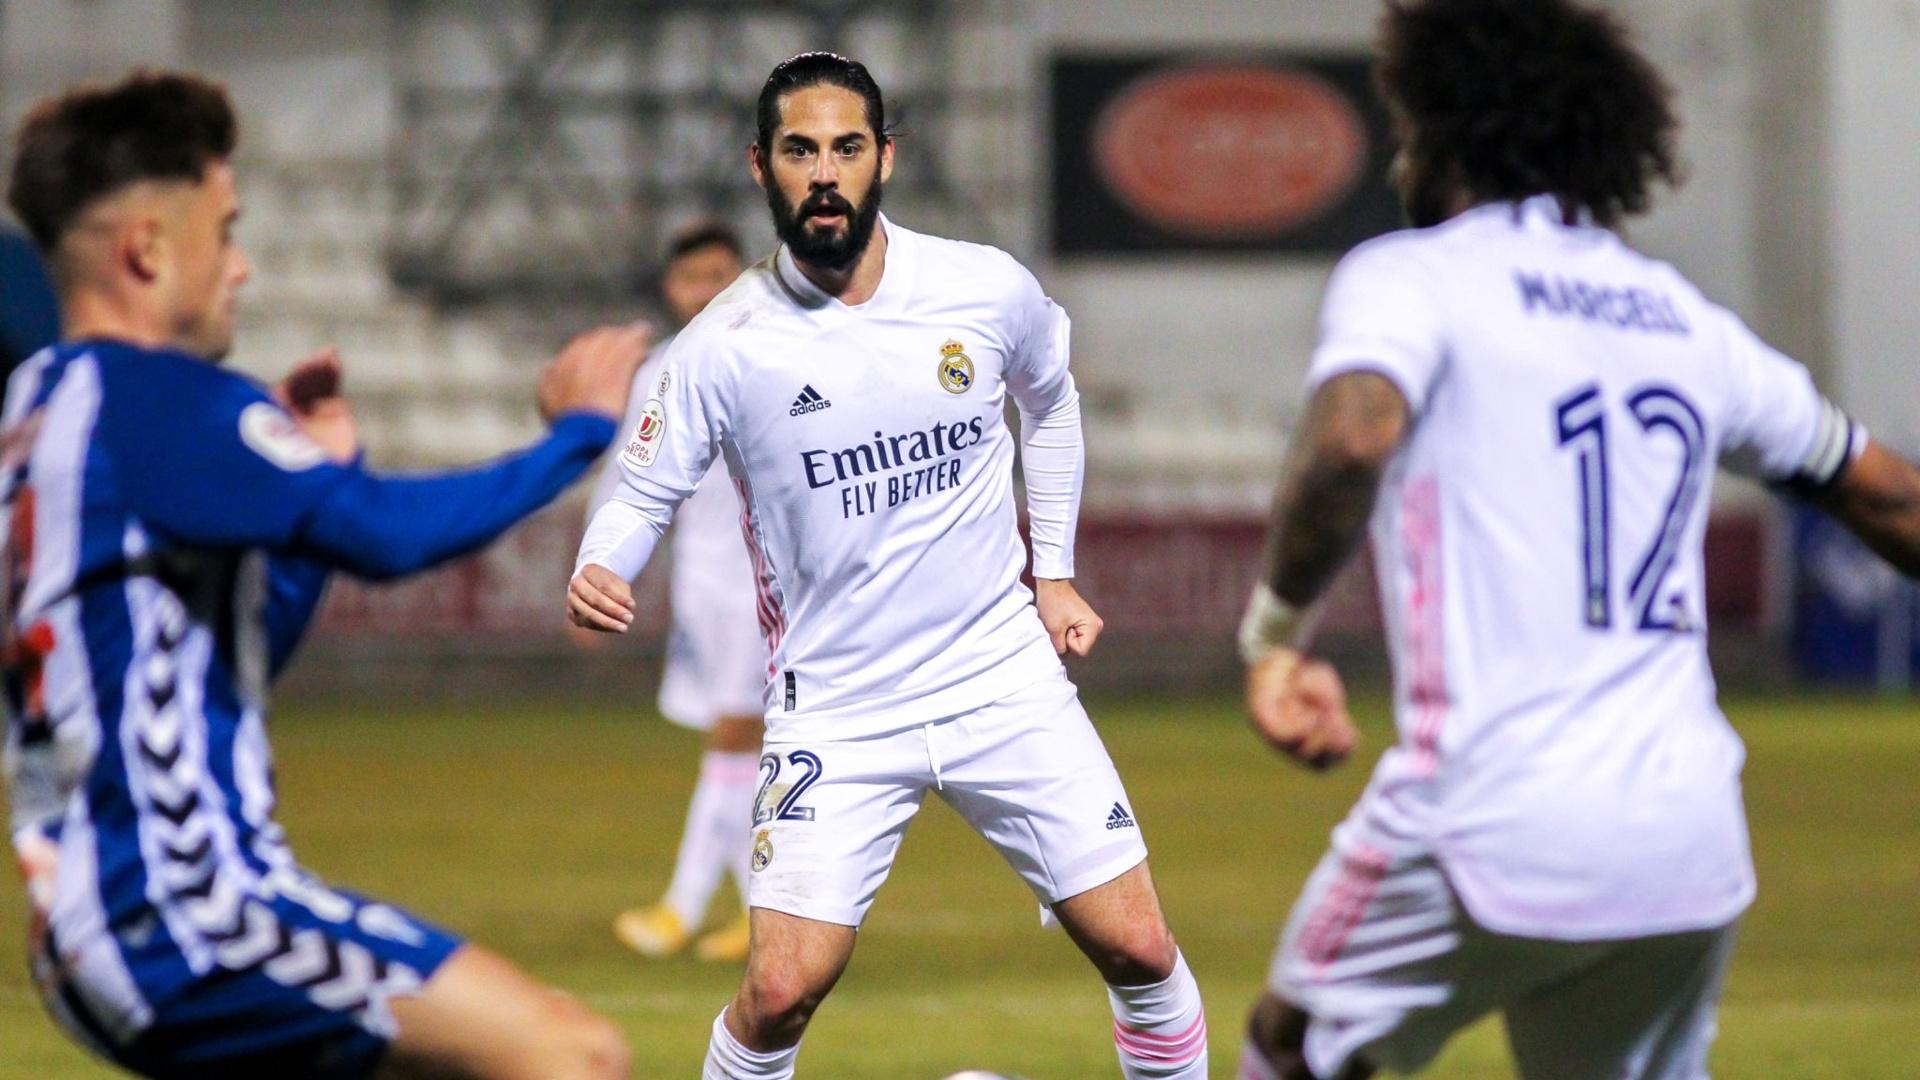 Match Report: CD Alcoyano 2-1 Real Madrid - Infinite Madrid